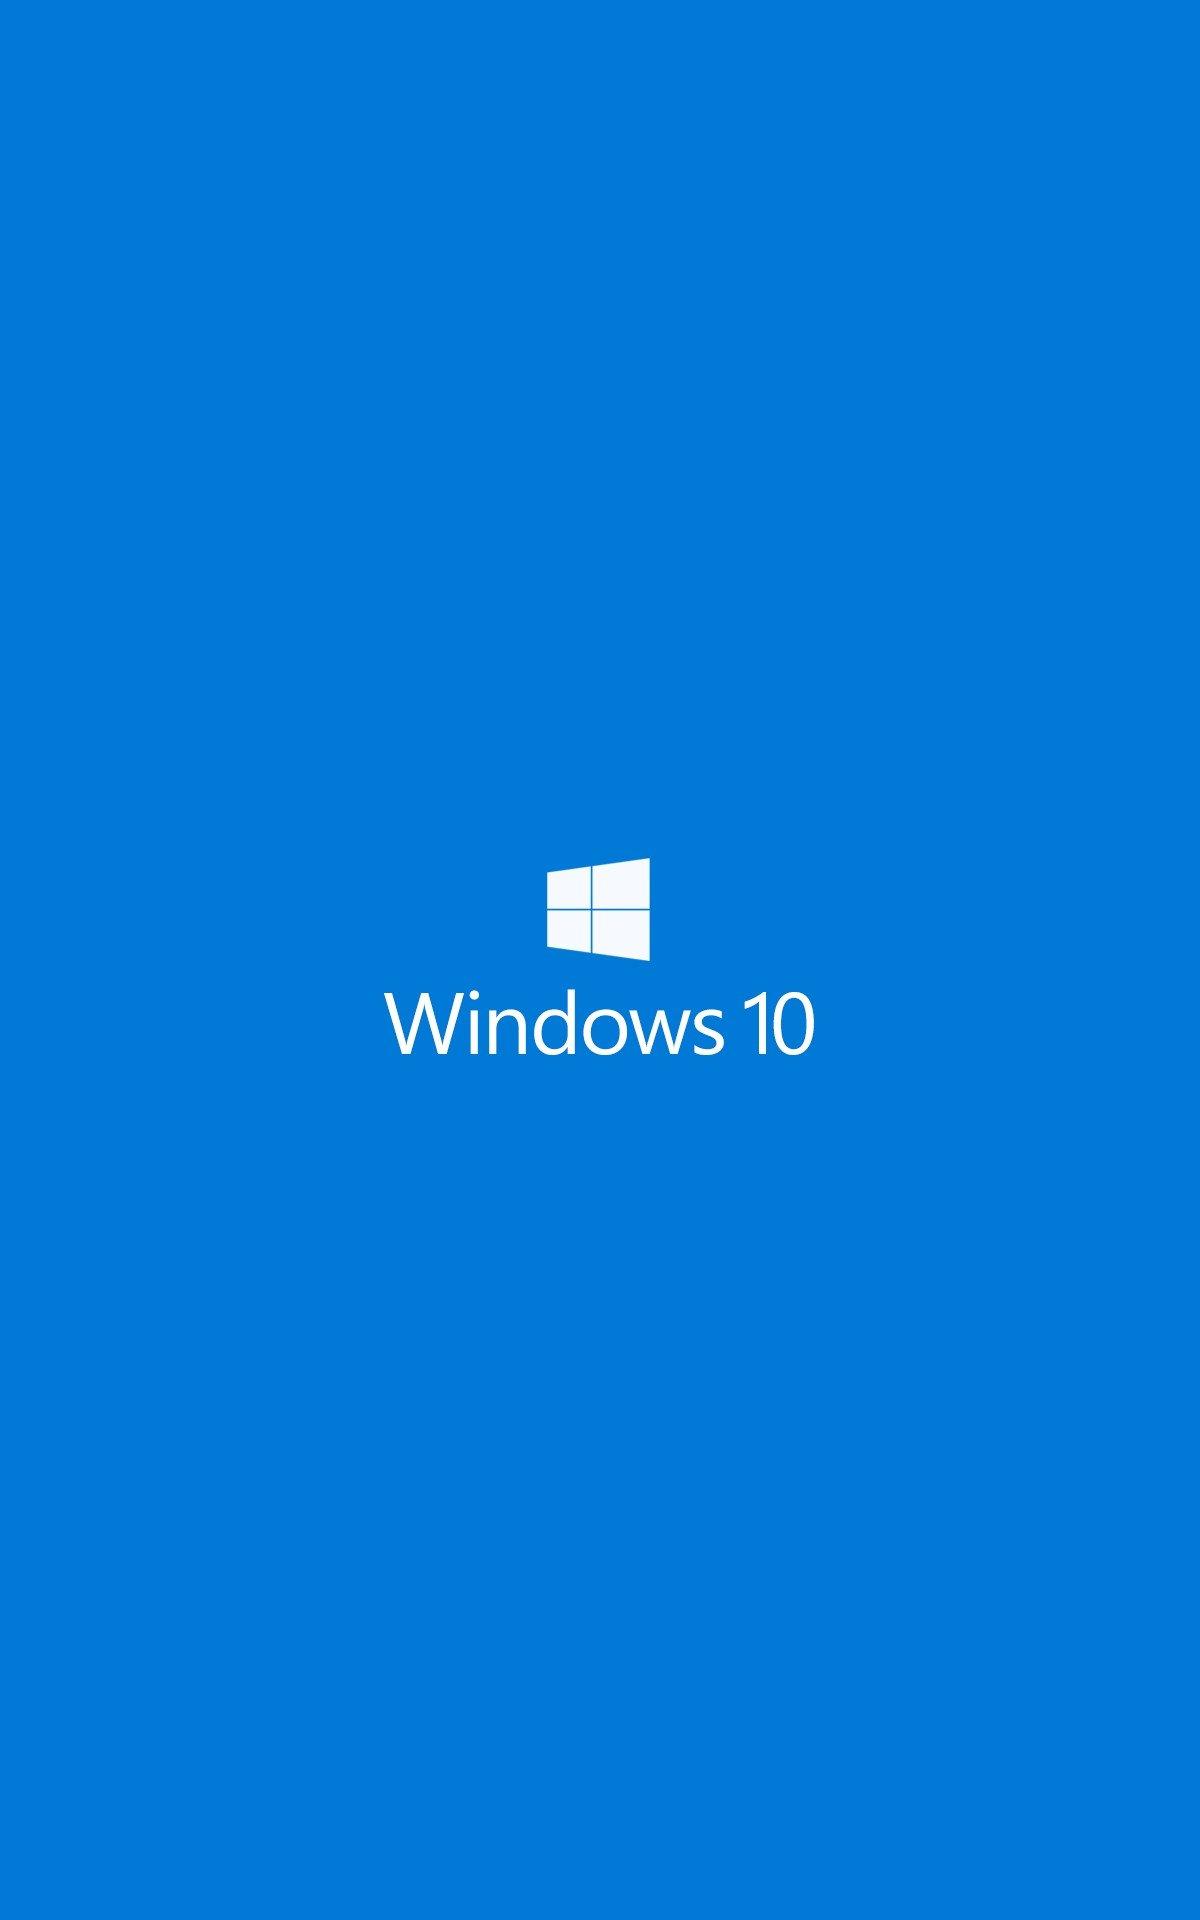 1200x1920 px Microsoft Windows minimalism operating systems portrait display Windows 10